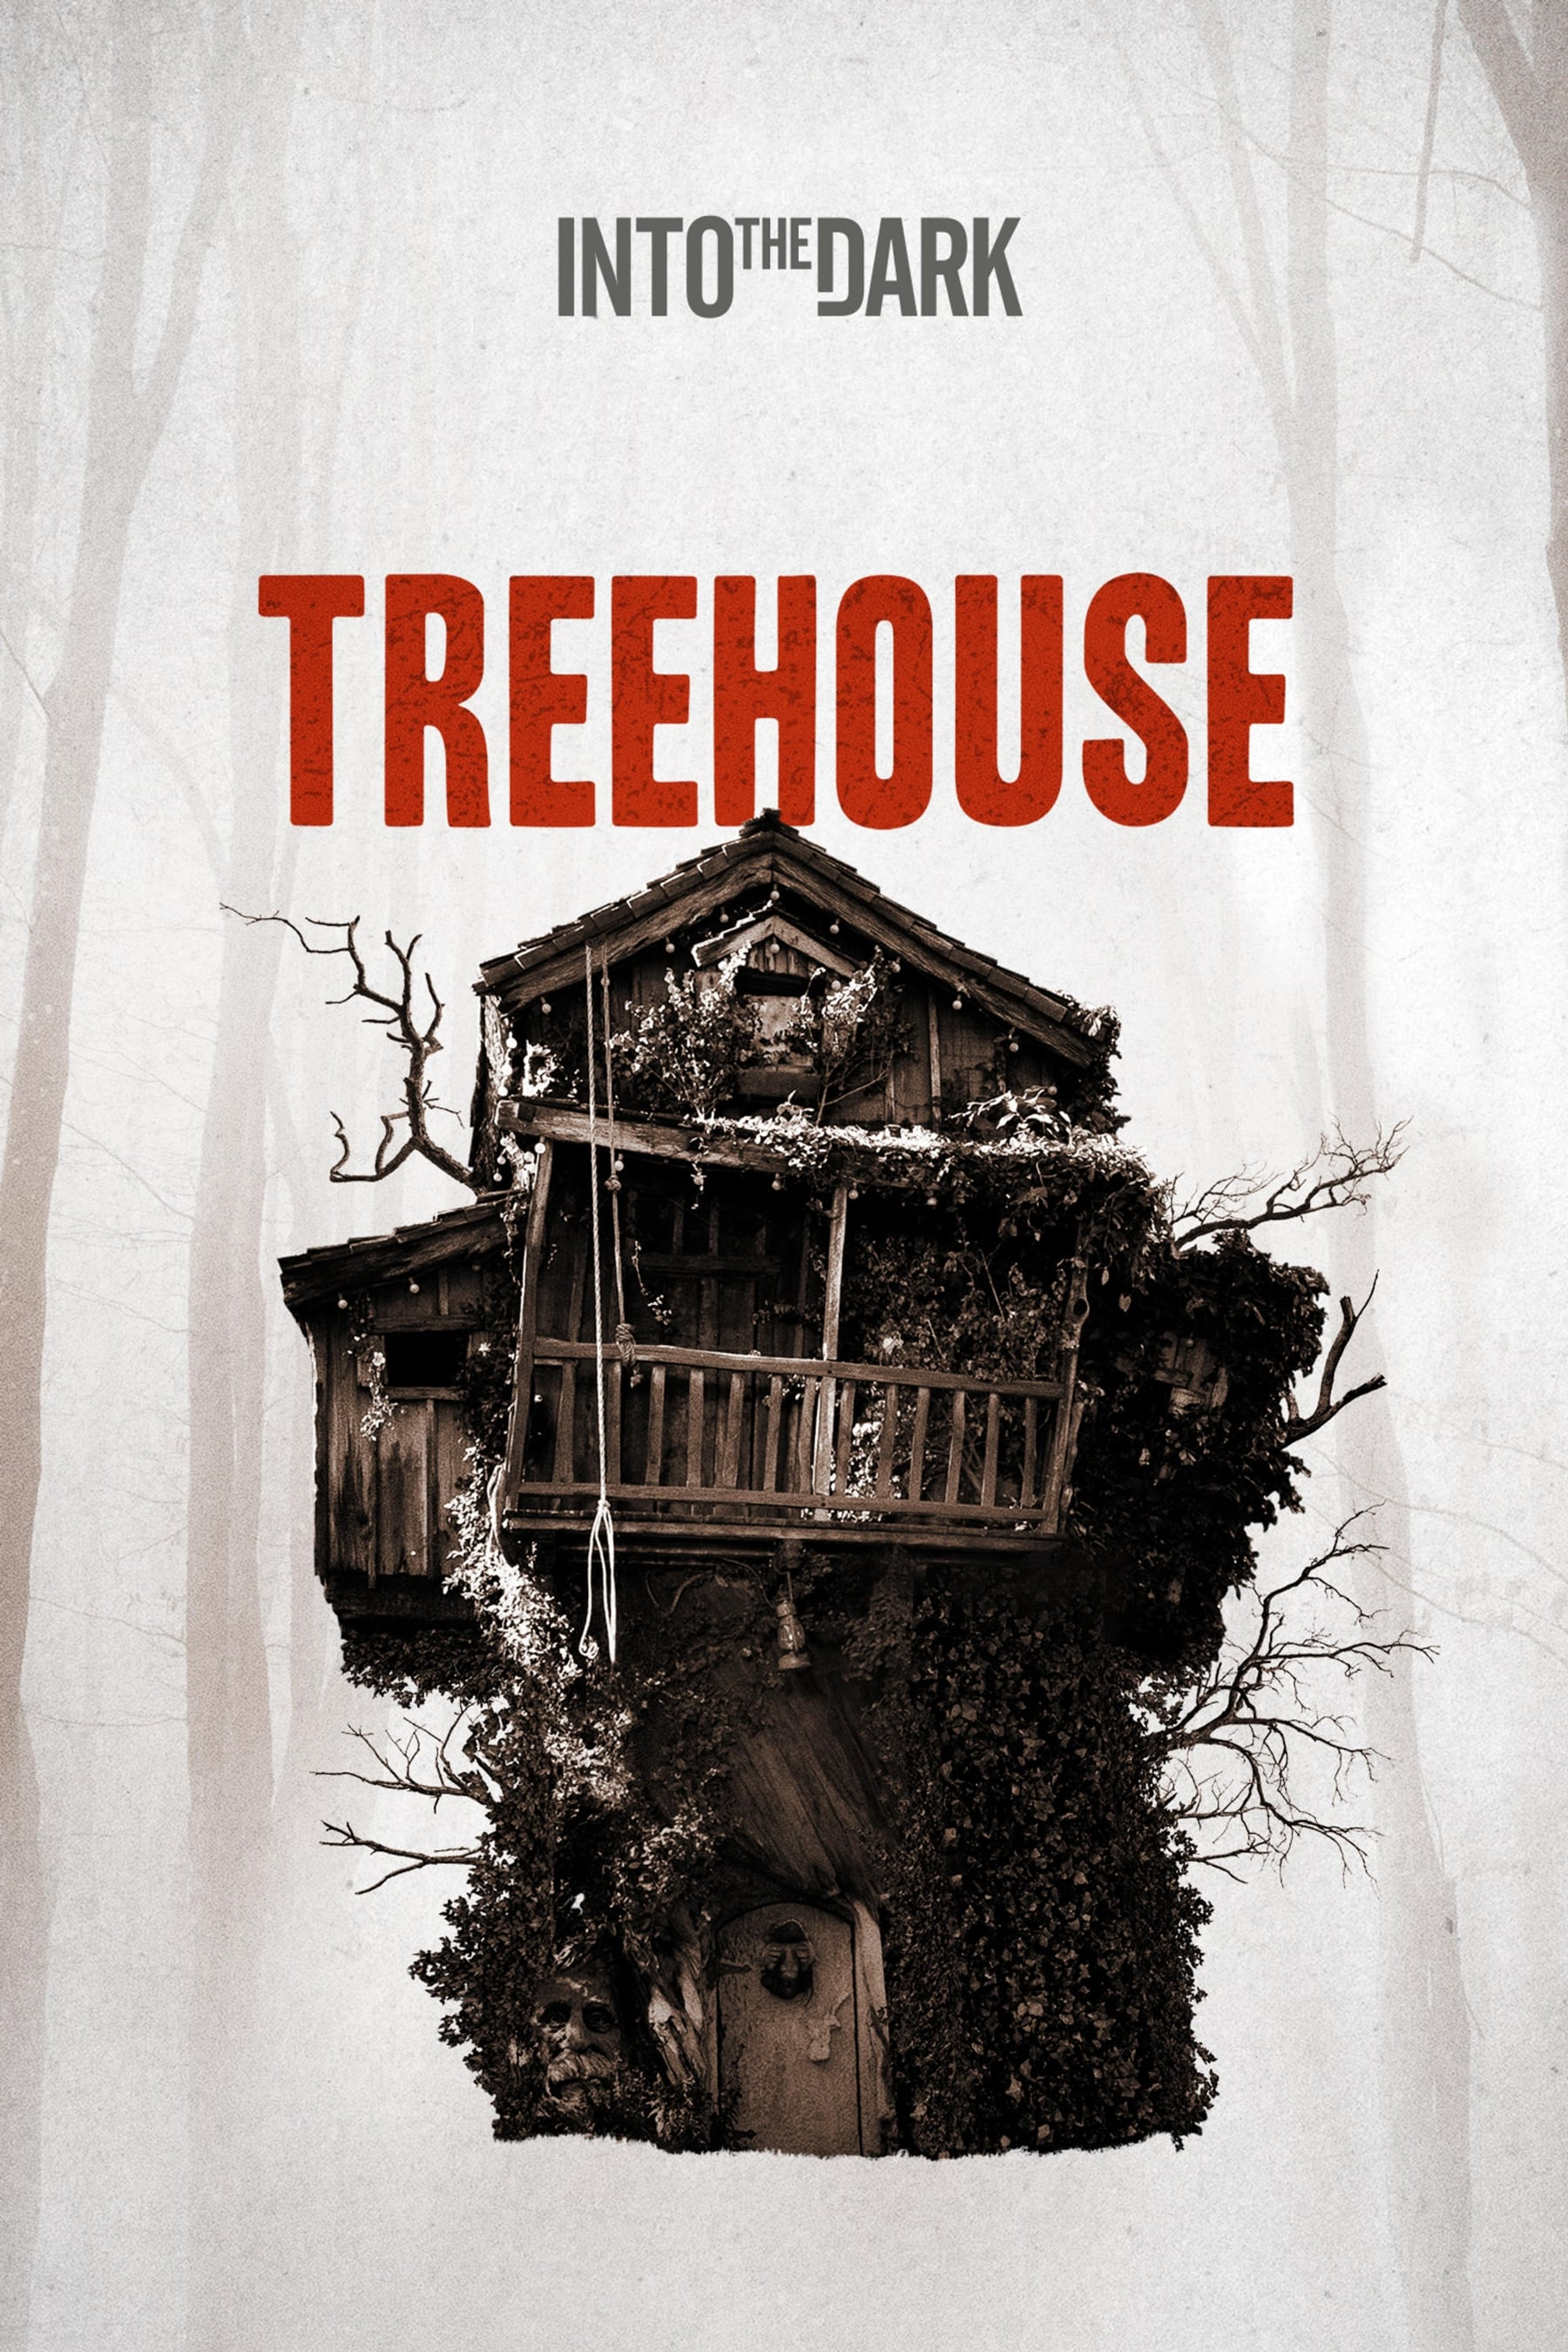 Into the Dark: Treehouse (2019)